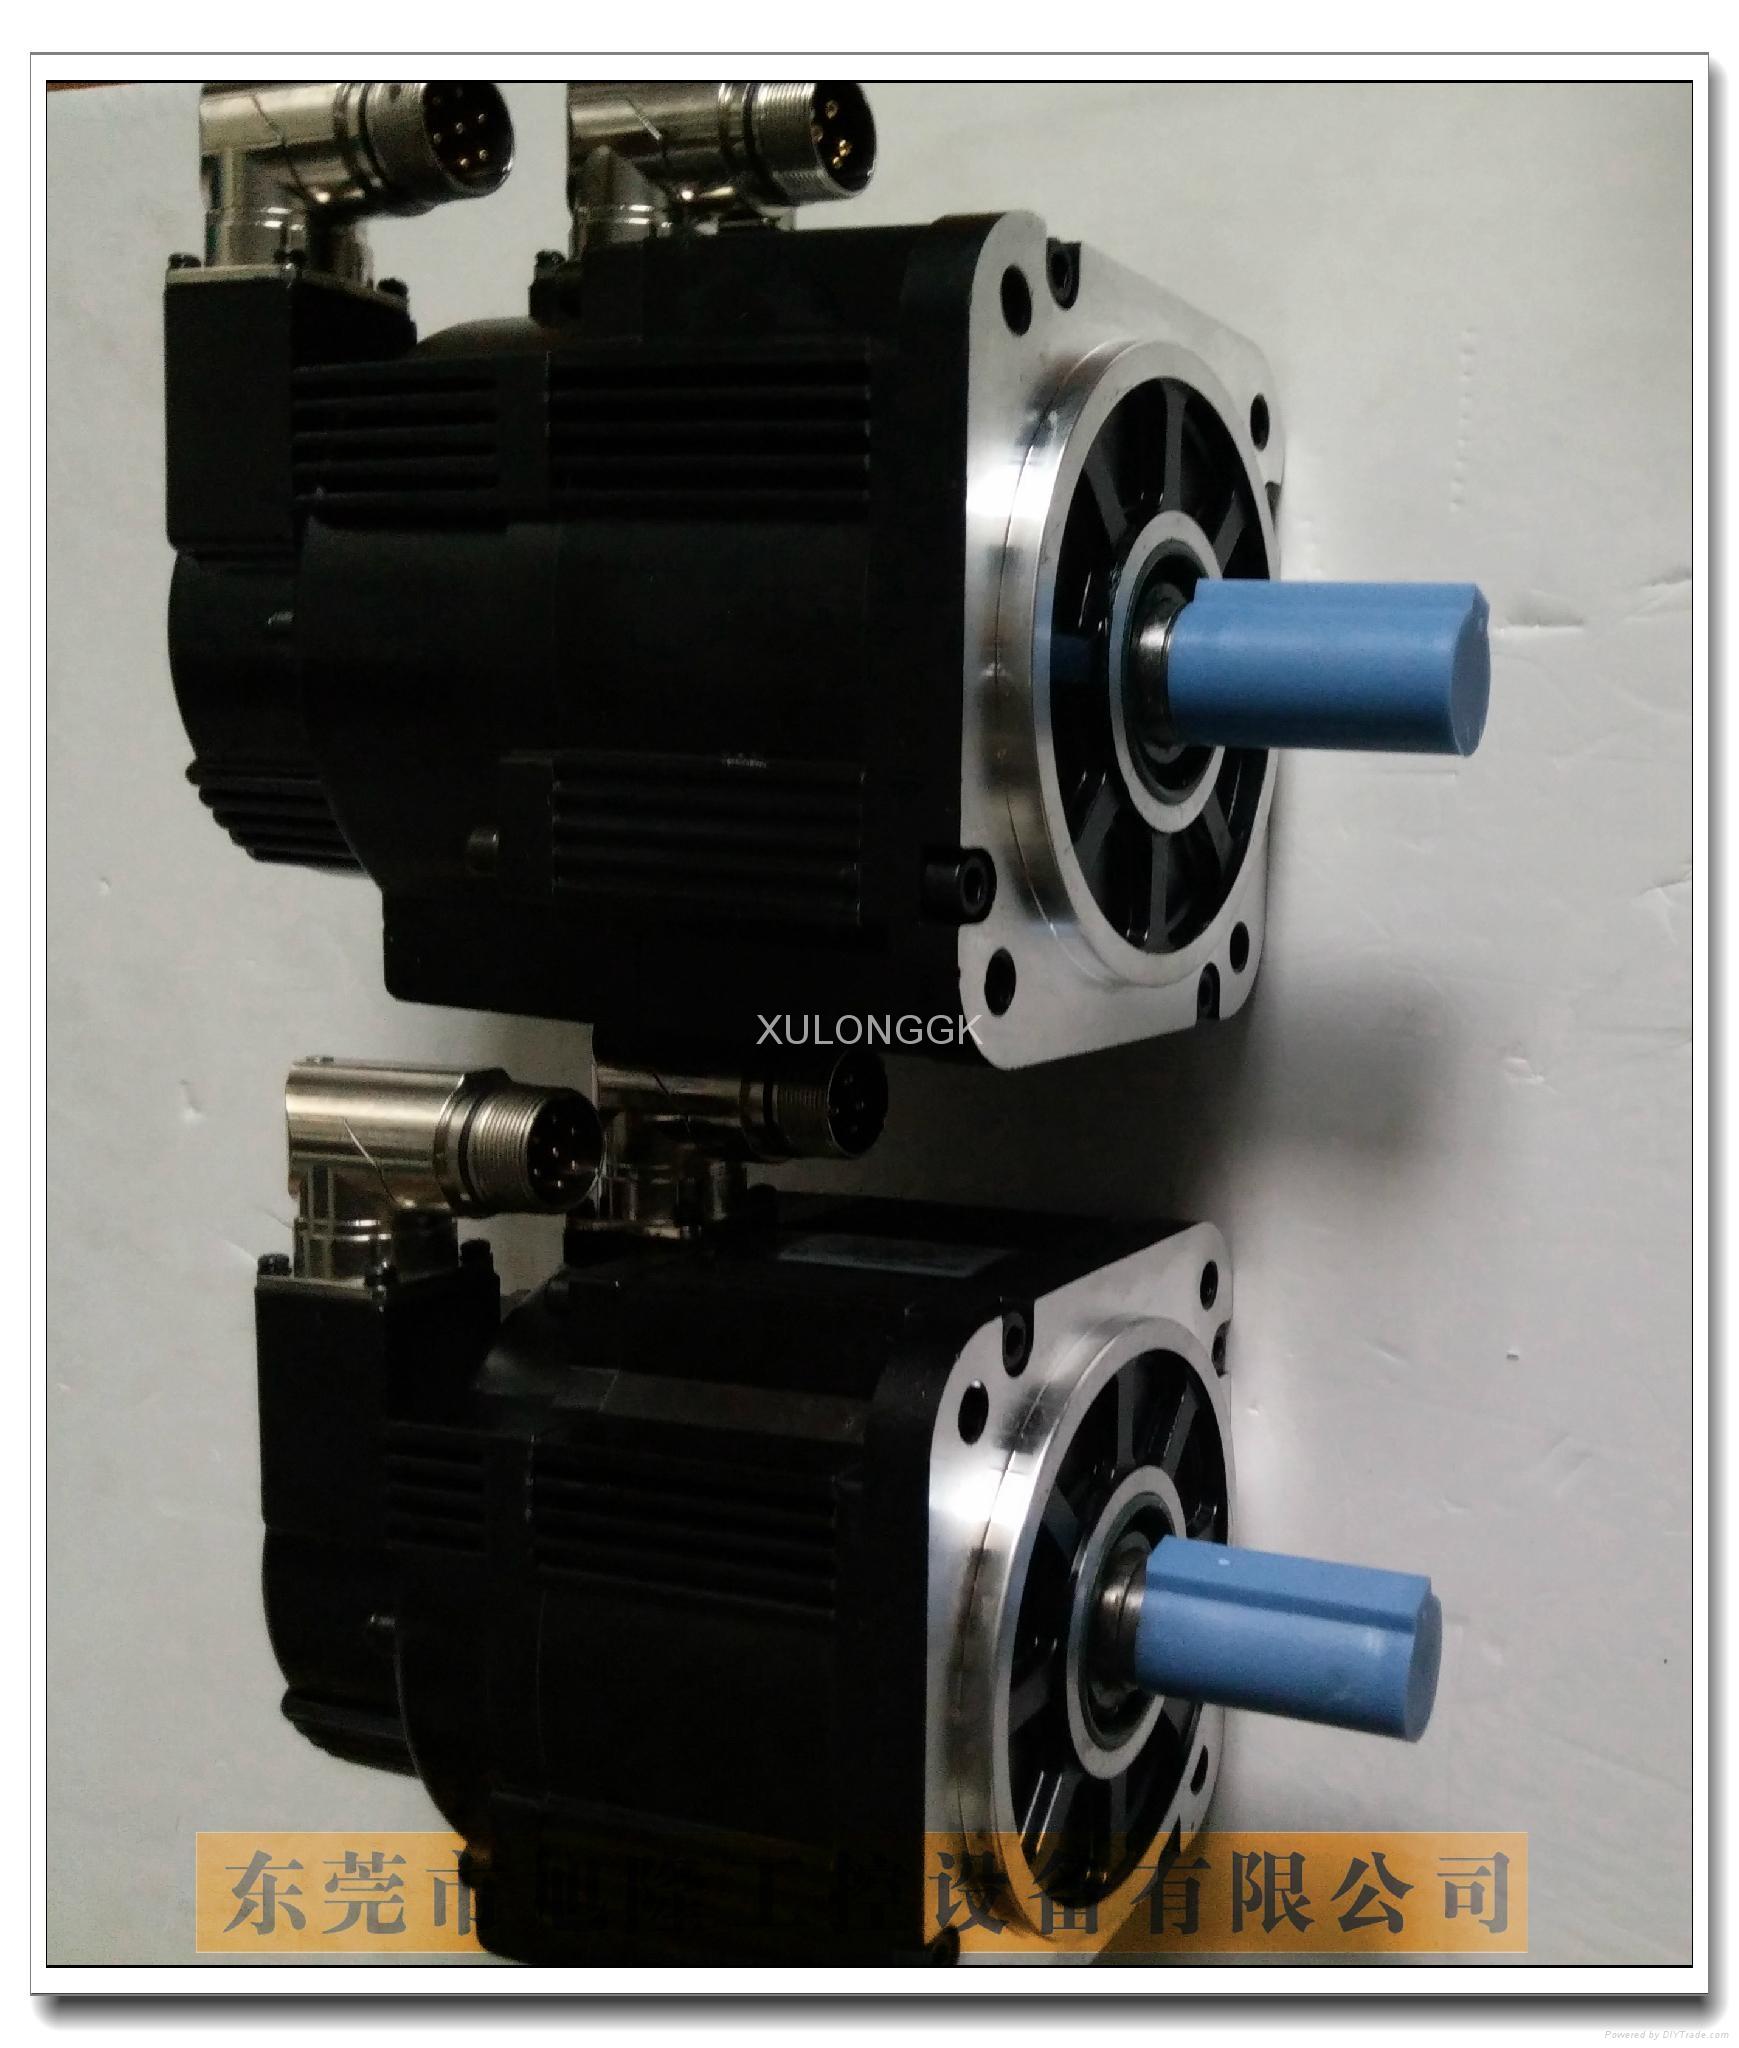 Ac servo drives 1 3kw 8 6n 17 23bit bus absolute value for Ac servo motor drive